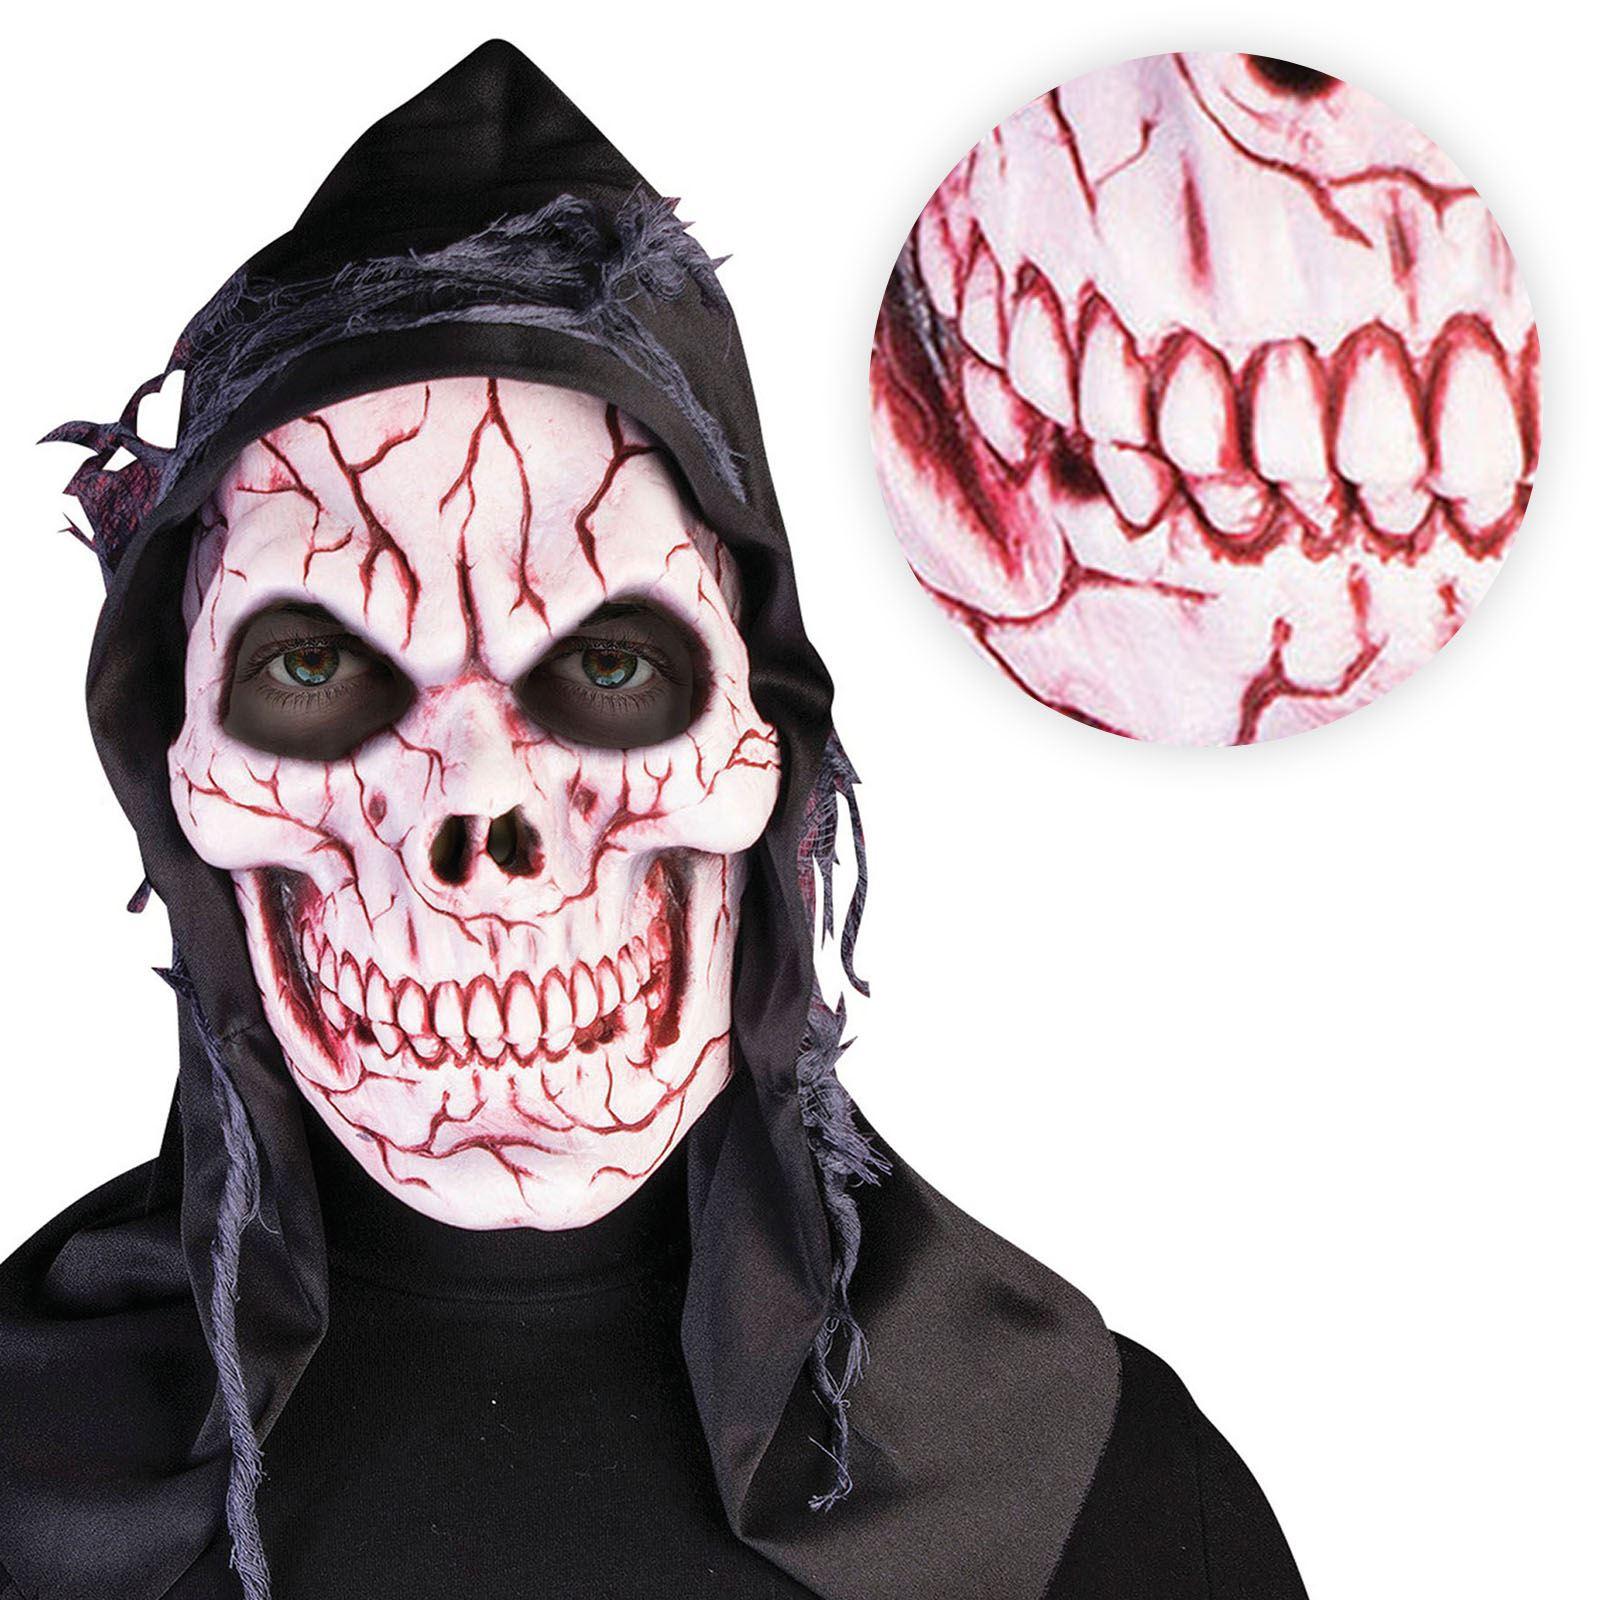 Black Hooded Bloody Skull Mask Reaper Zombie Horror Halloween ...